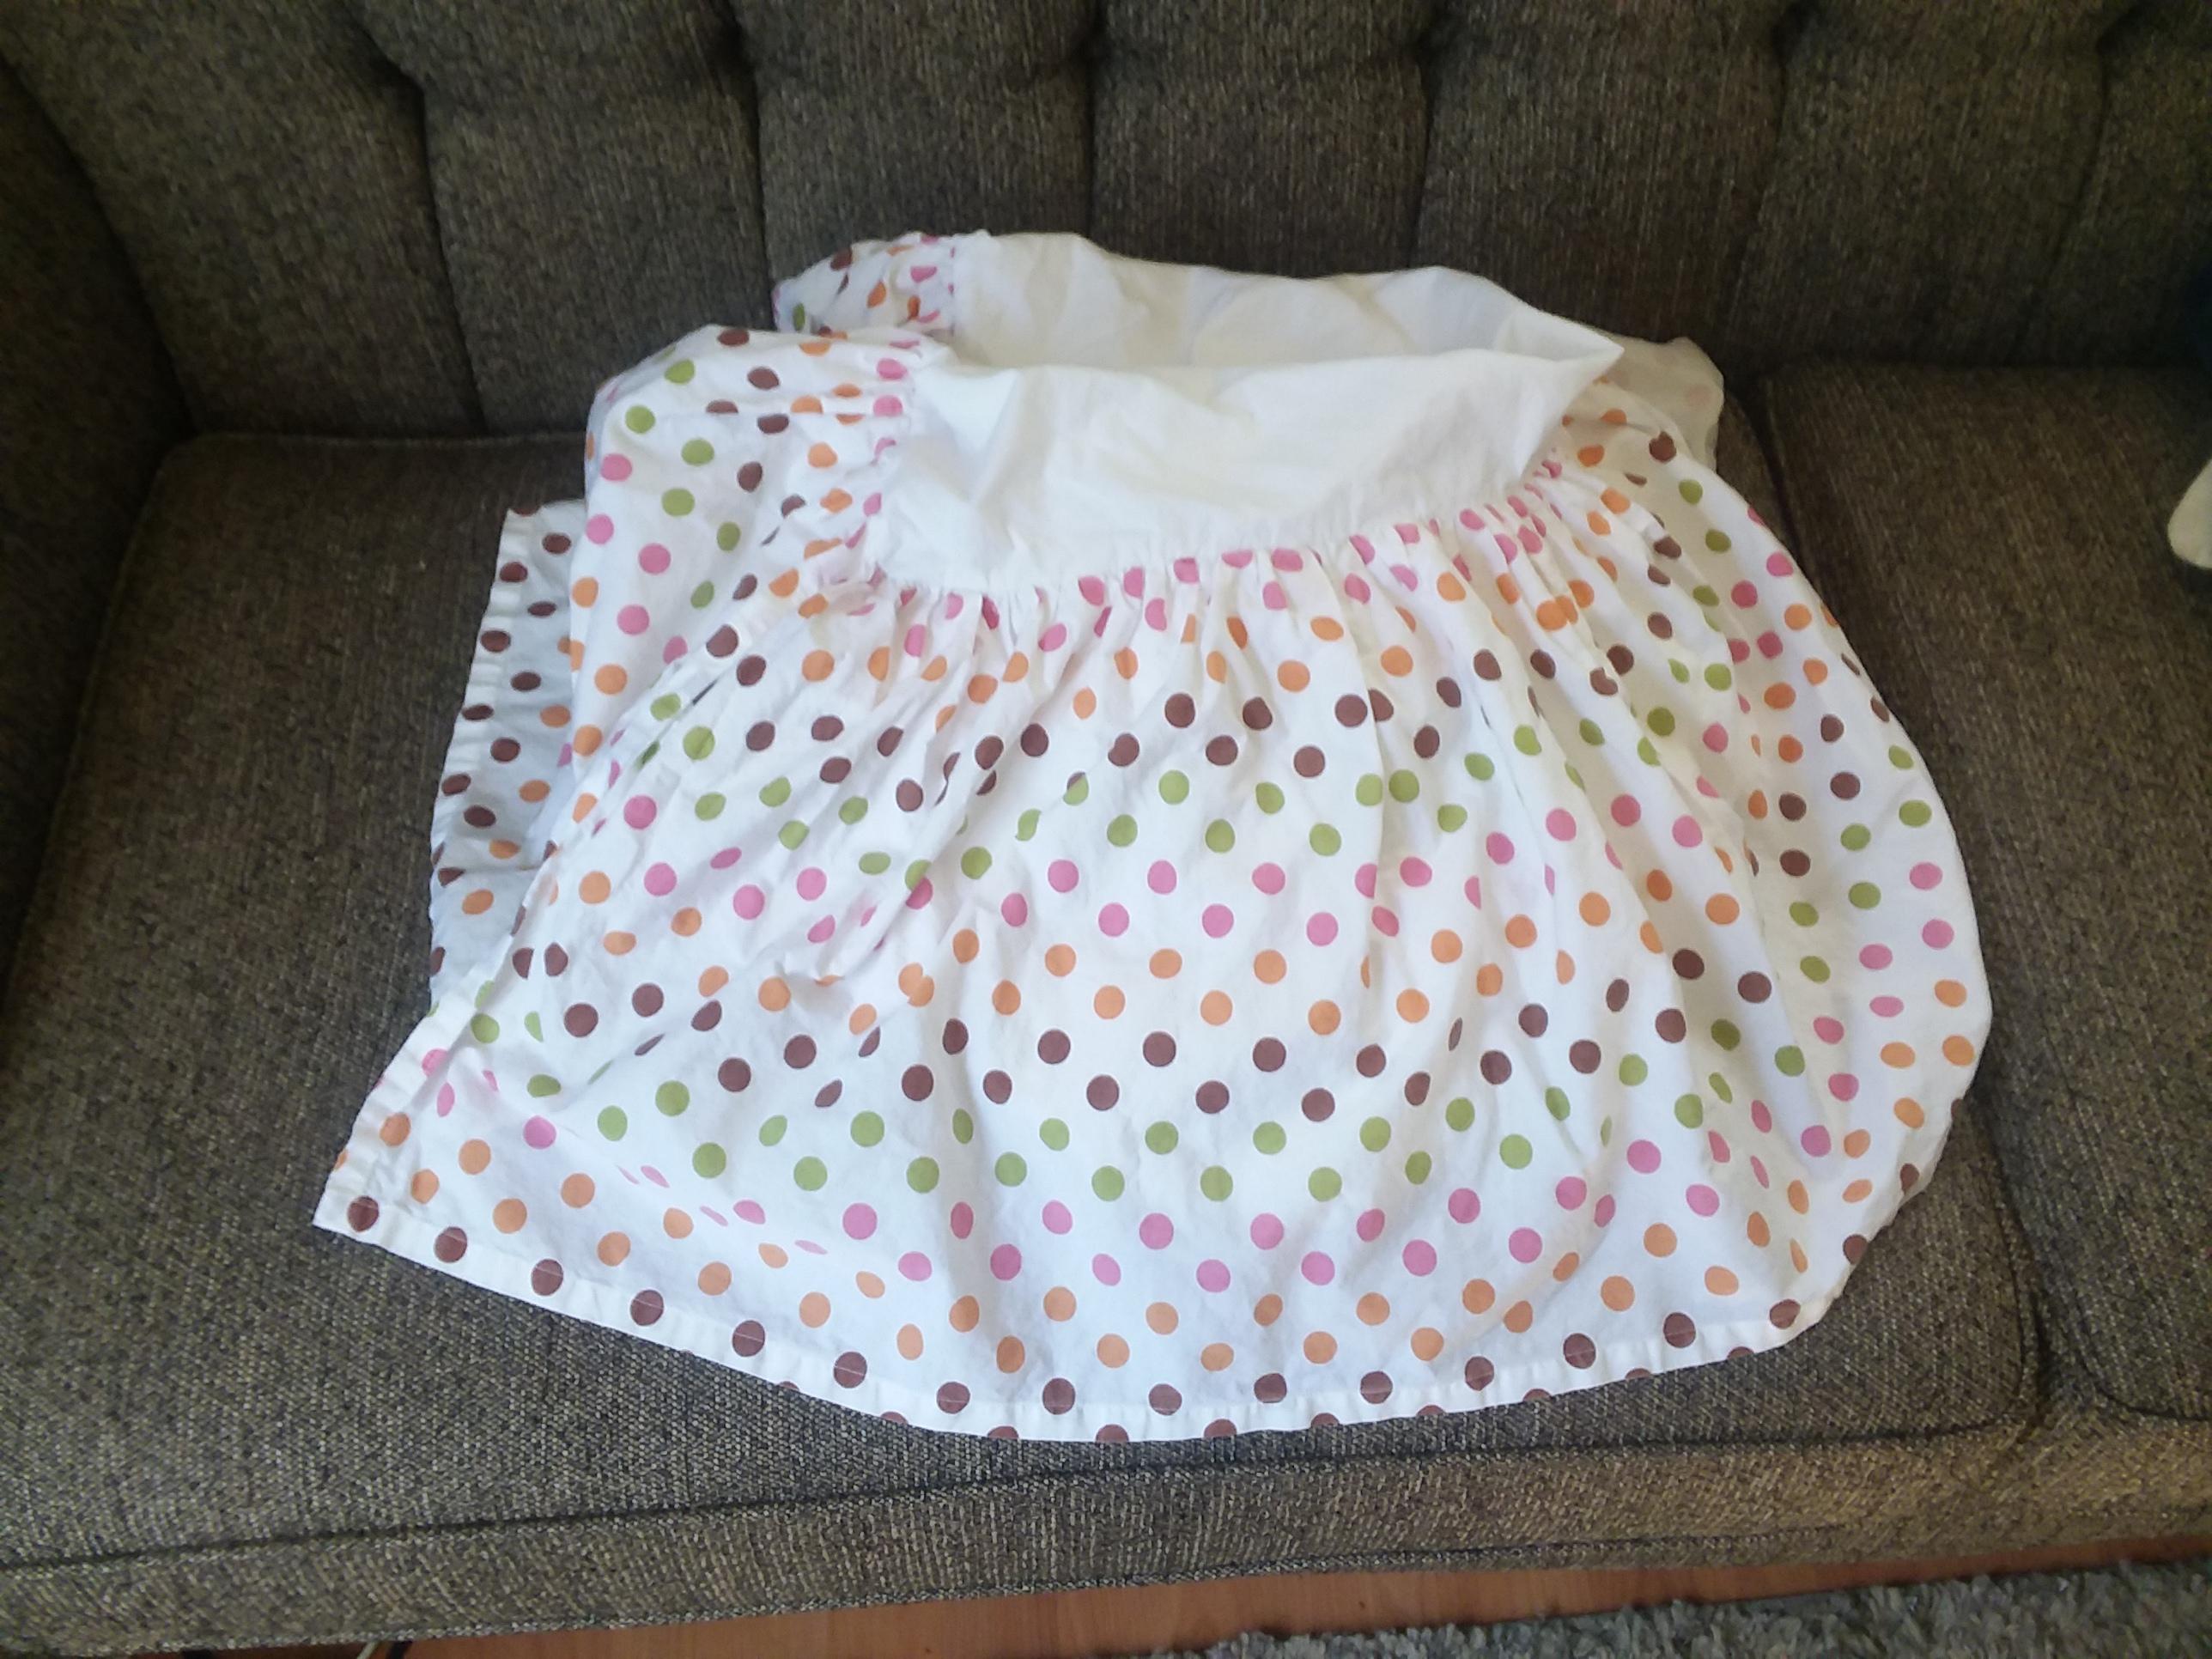 Crib skirt by Land of Nod